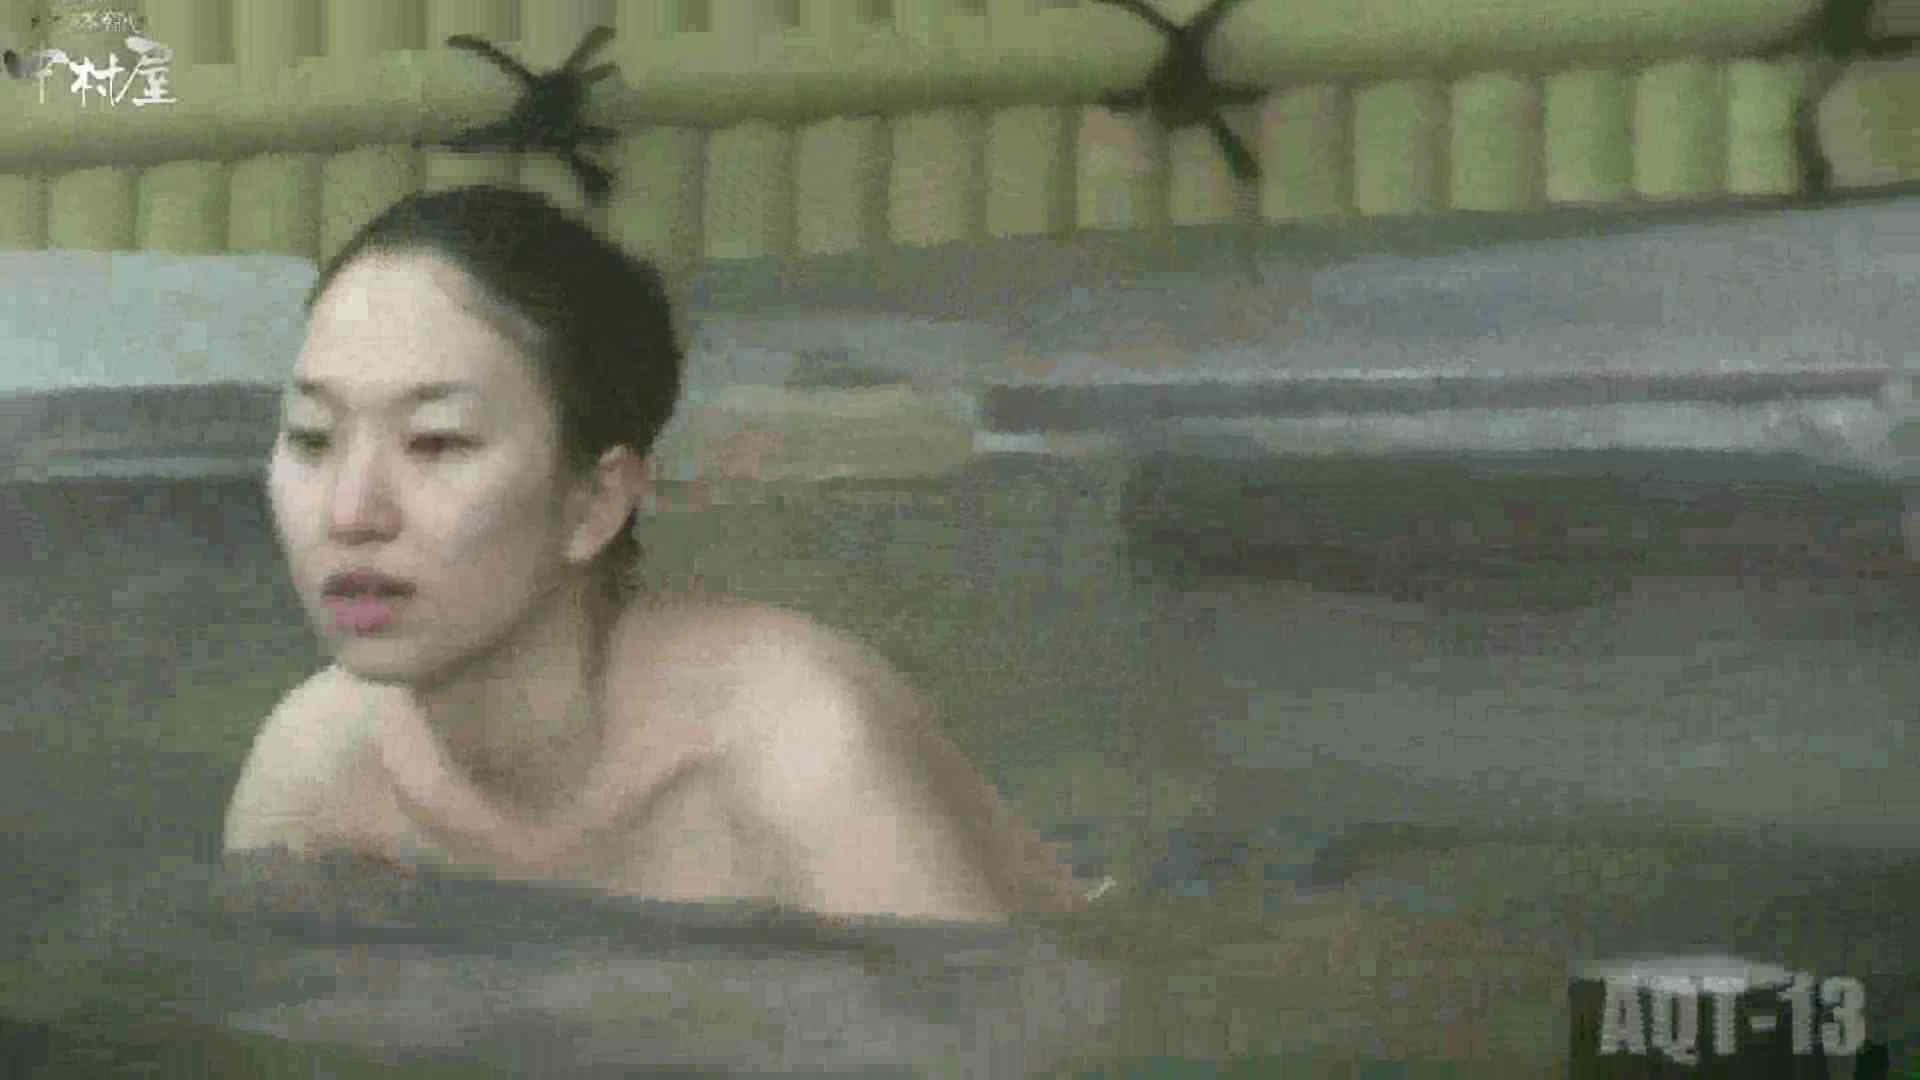 Aquaな露天風呂Vol.877潜入盗撮露天風呂十三判湯 其の四 潜入 | OLセックス  50画像 41